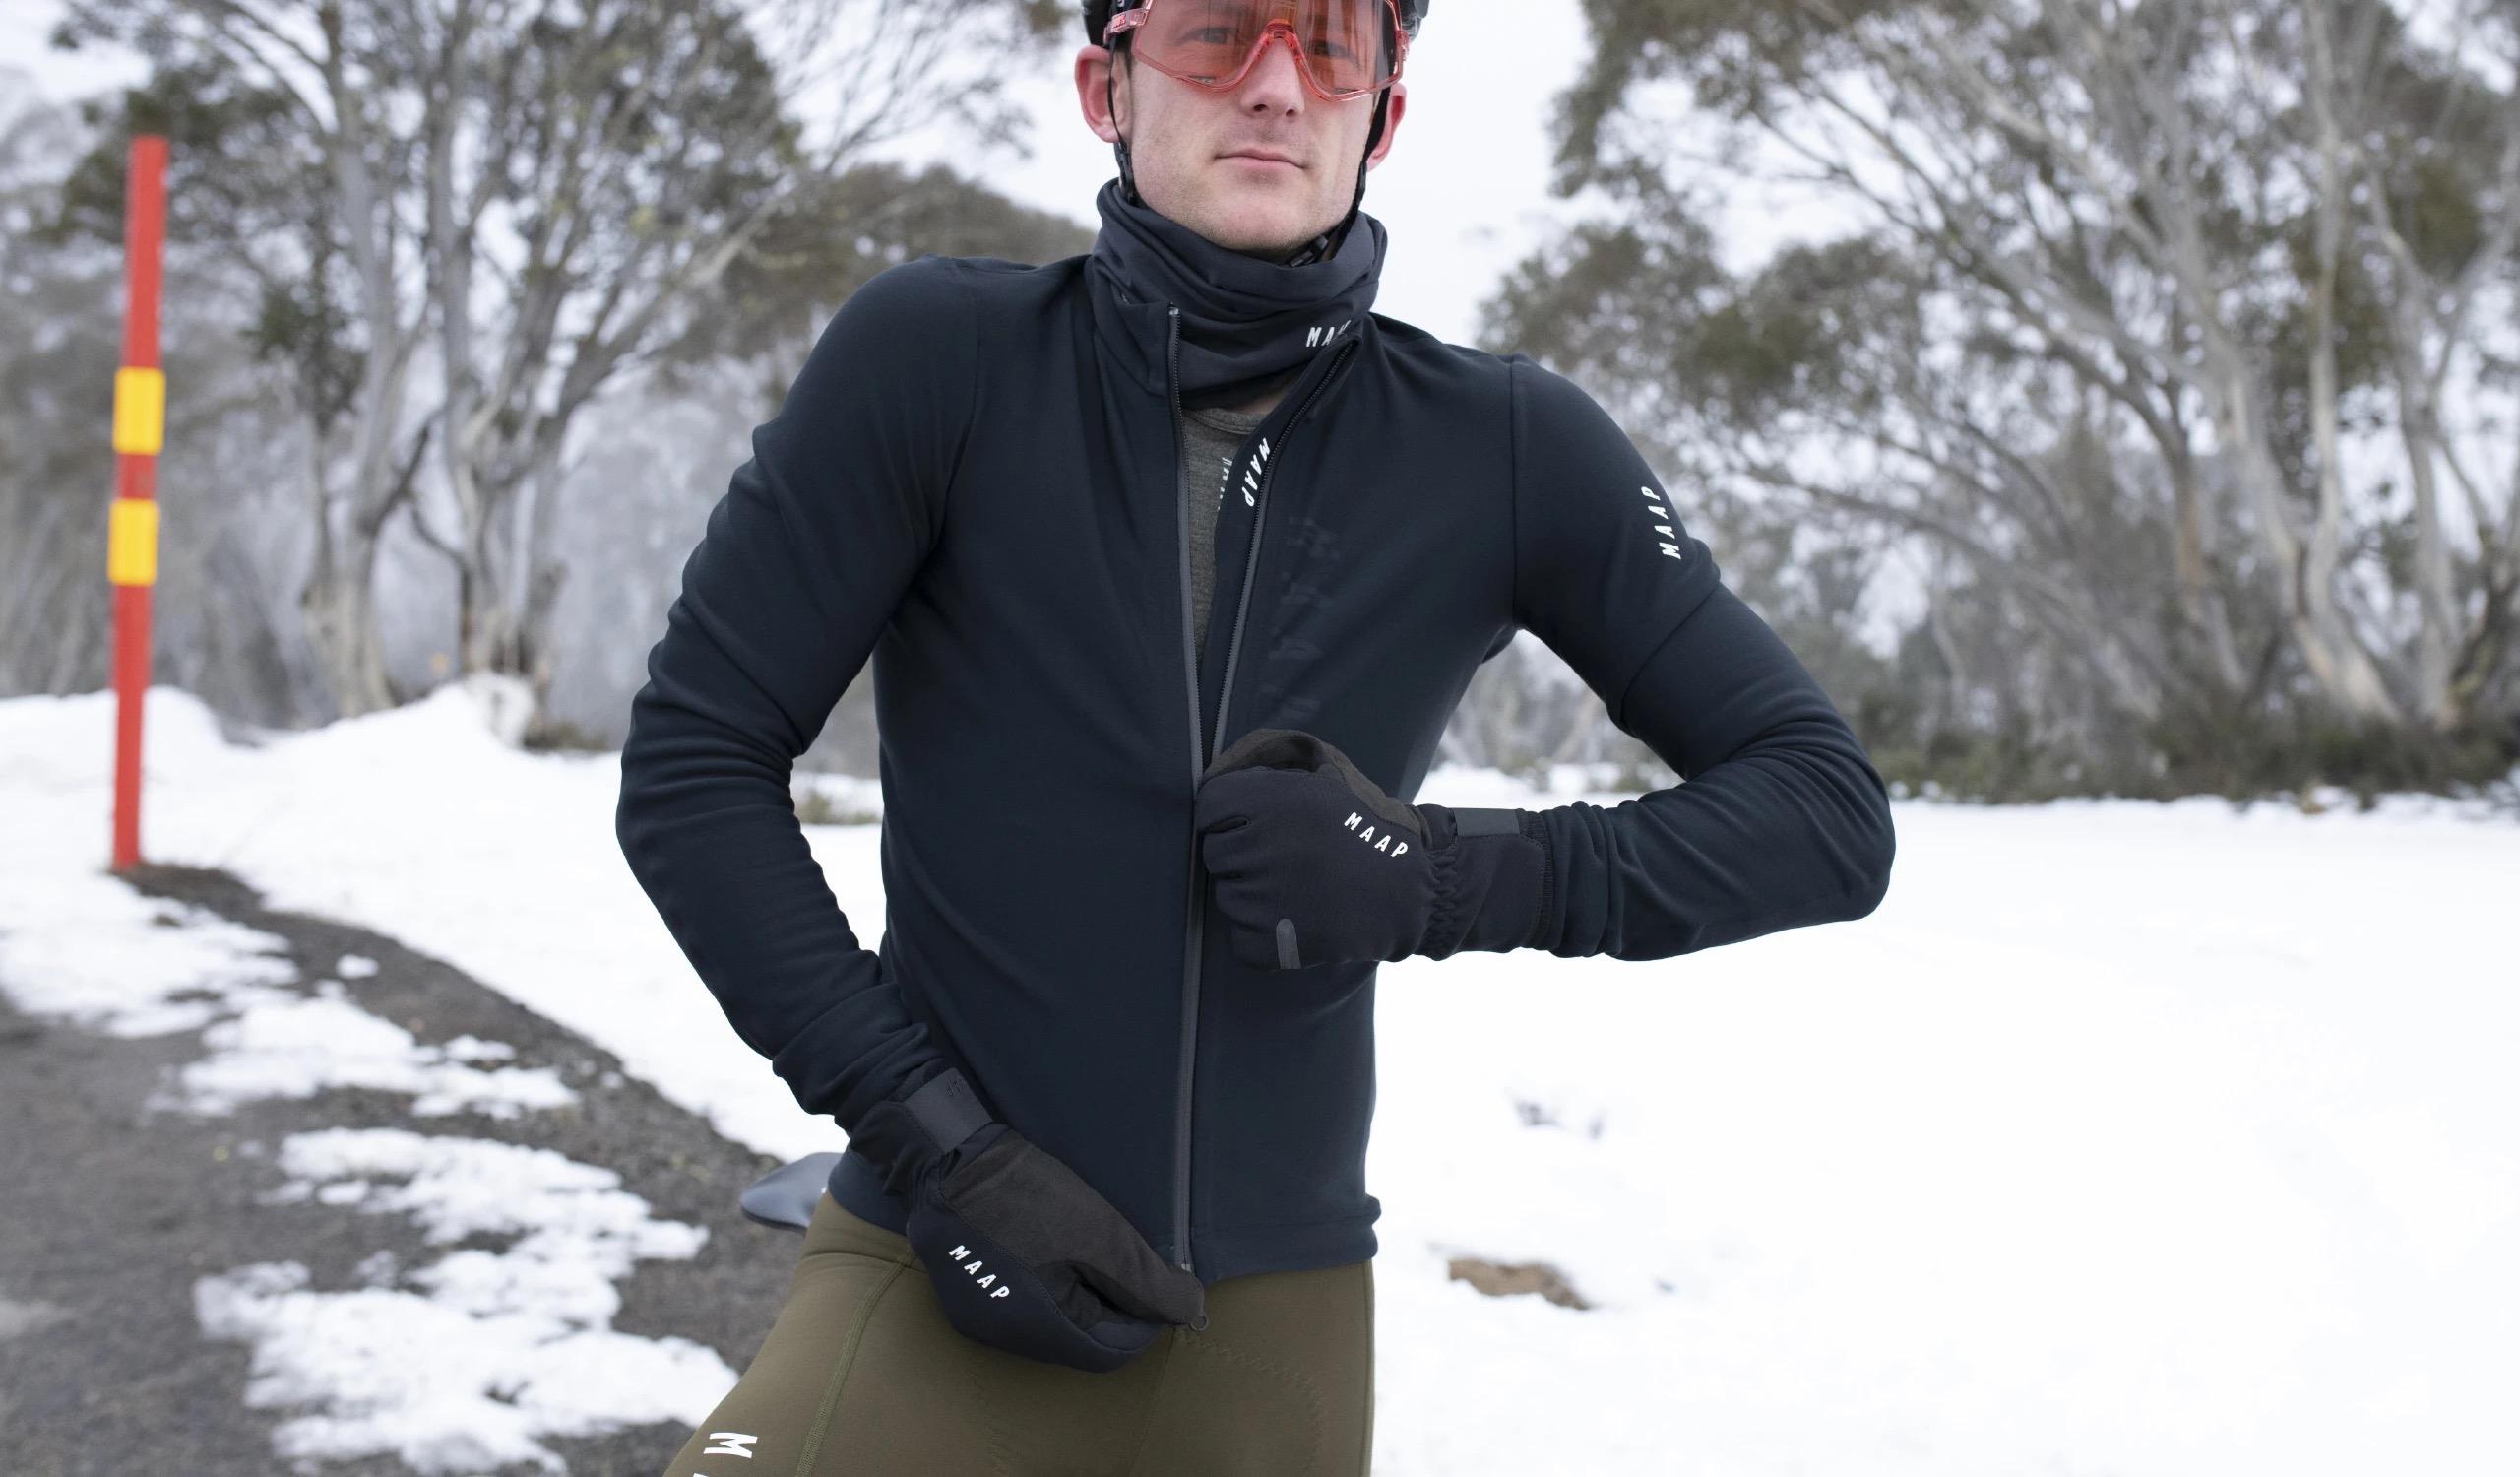 Men's Apex Winter Jacket 2.0 / Black